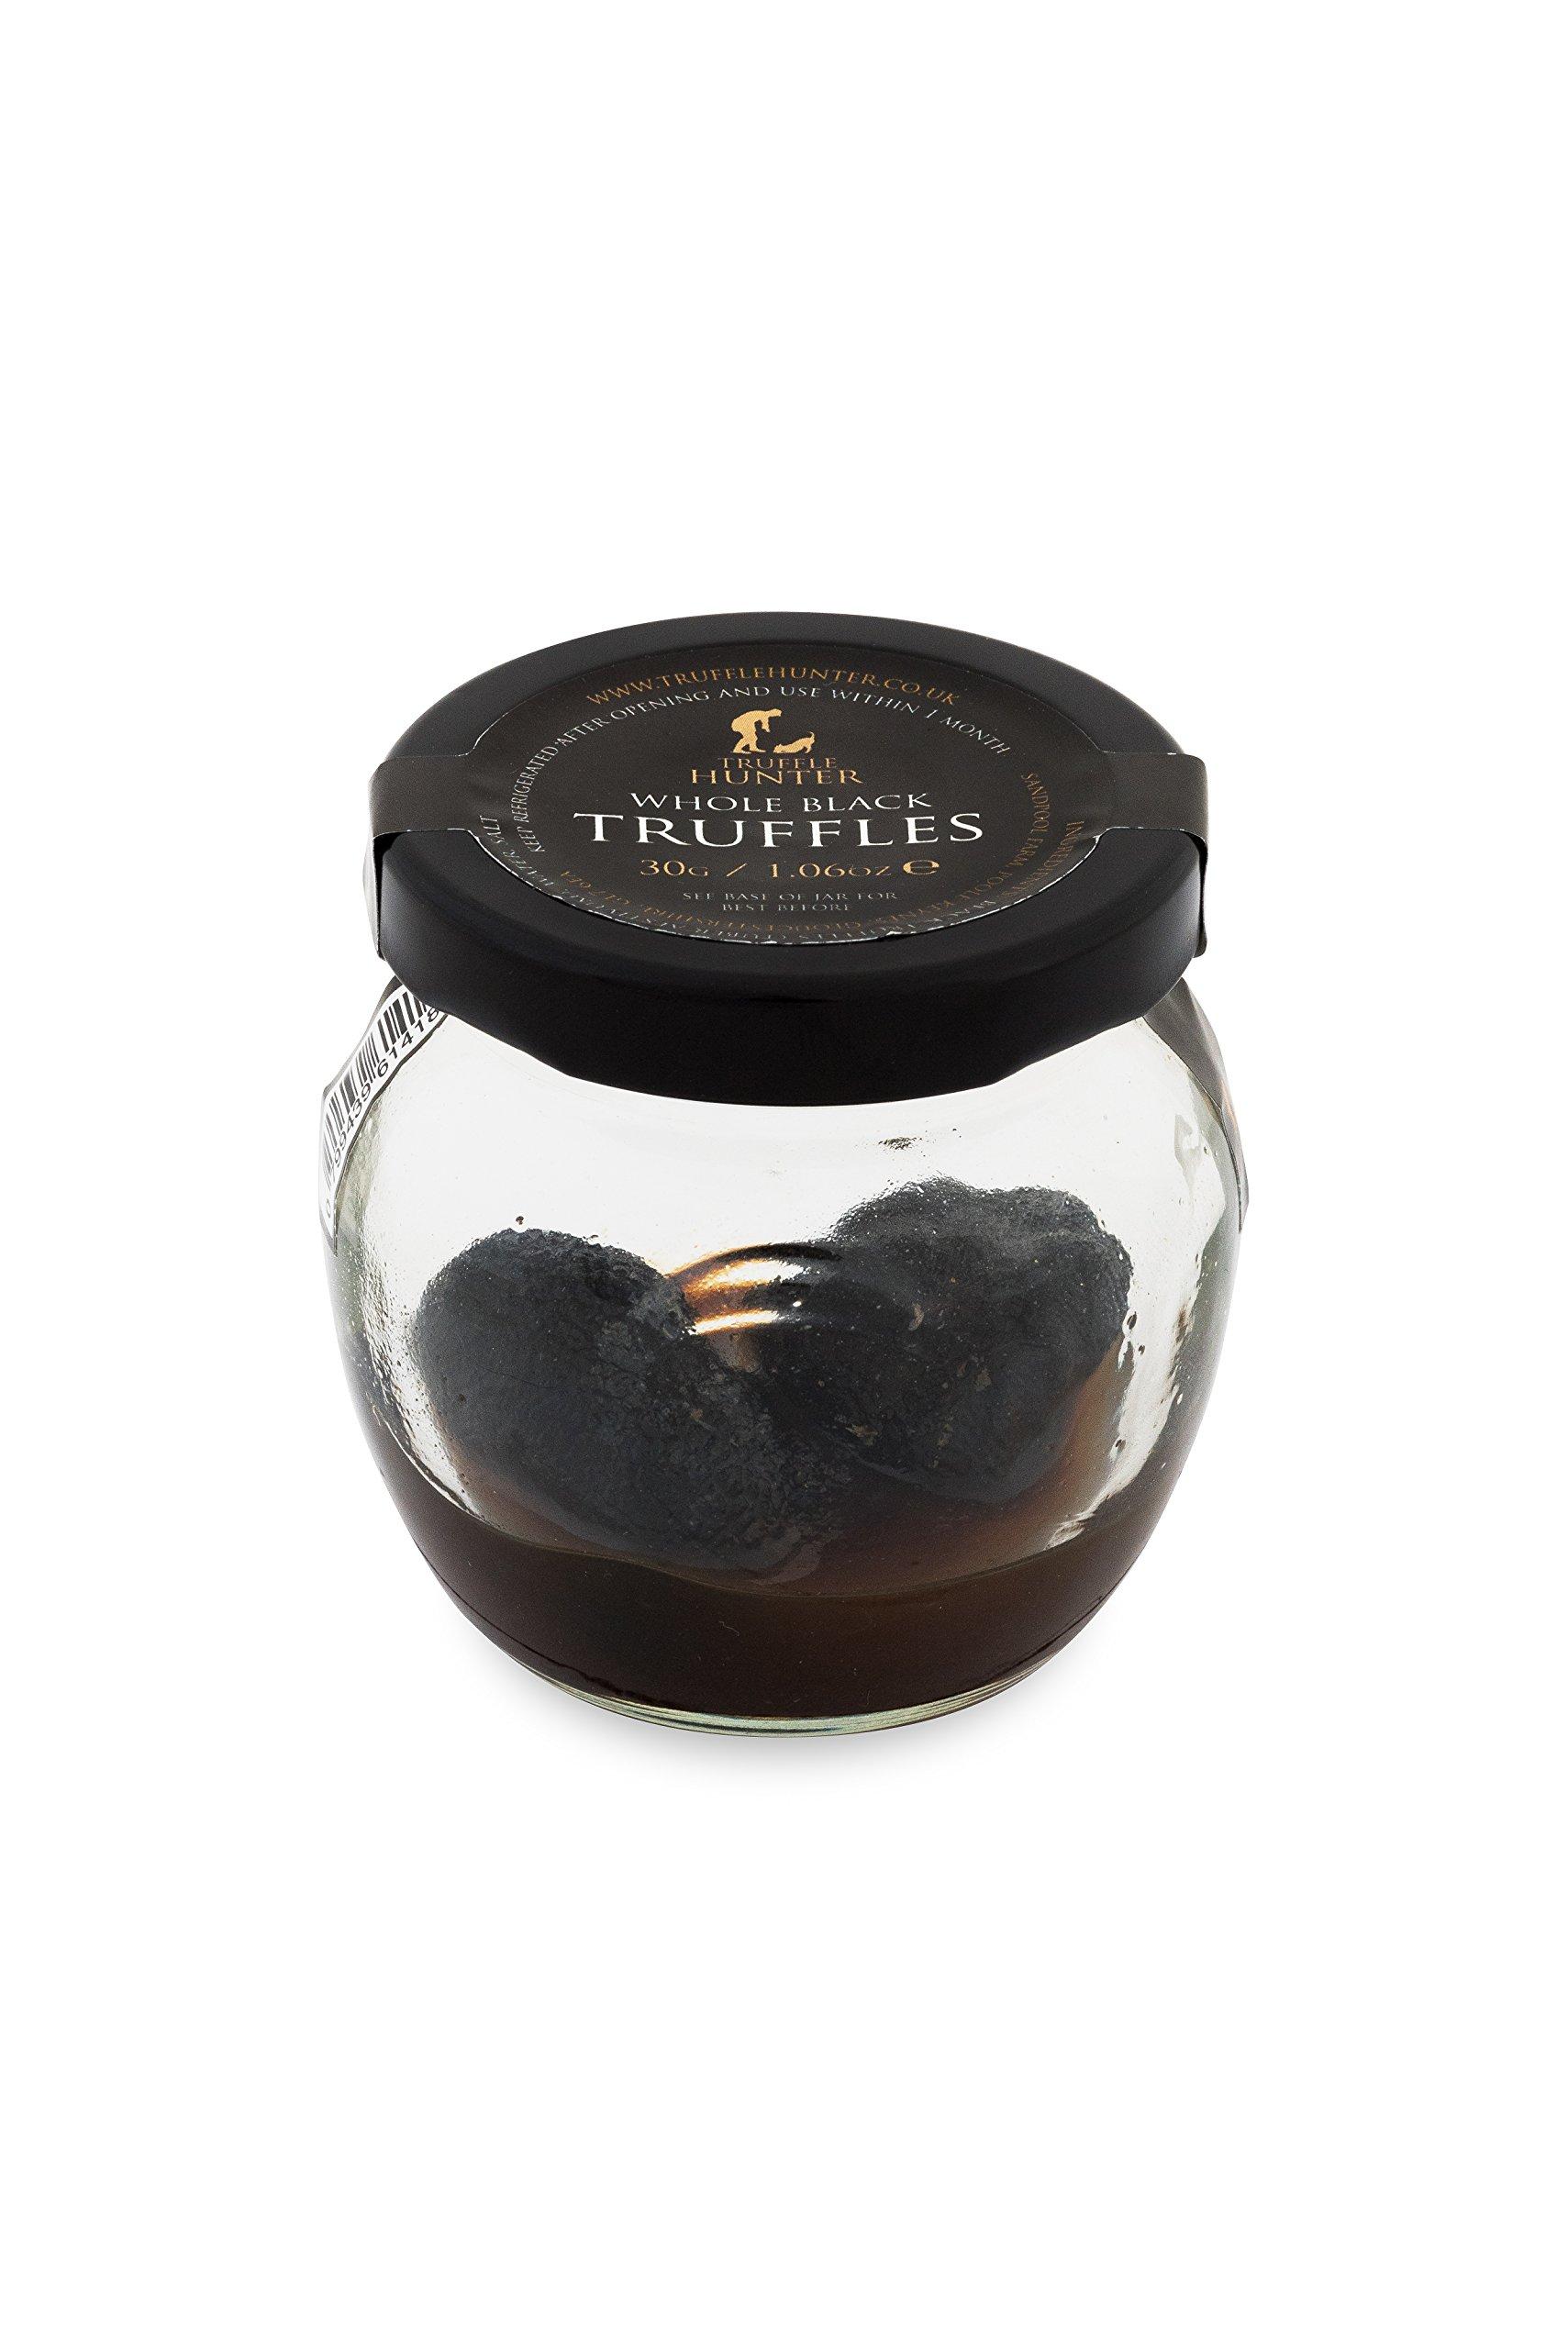 TruffleHunter Whole Black Truffles (Tuber Aestivum) Preserved in Brine (1.06 Oz) - Truffle Mushroom Gourmet Food - Vegan Vegetarian Kosher & Gluten Free - No MSG and Non-GMO